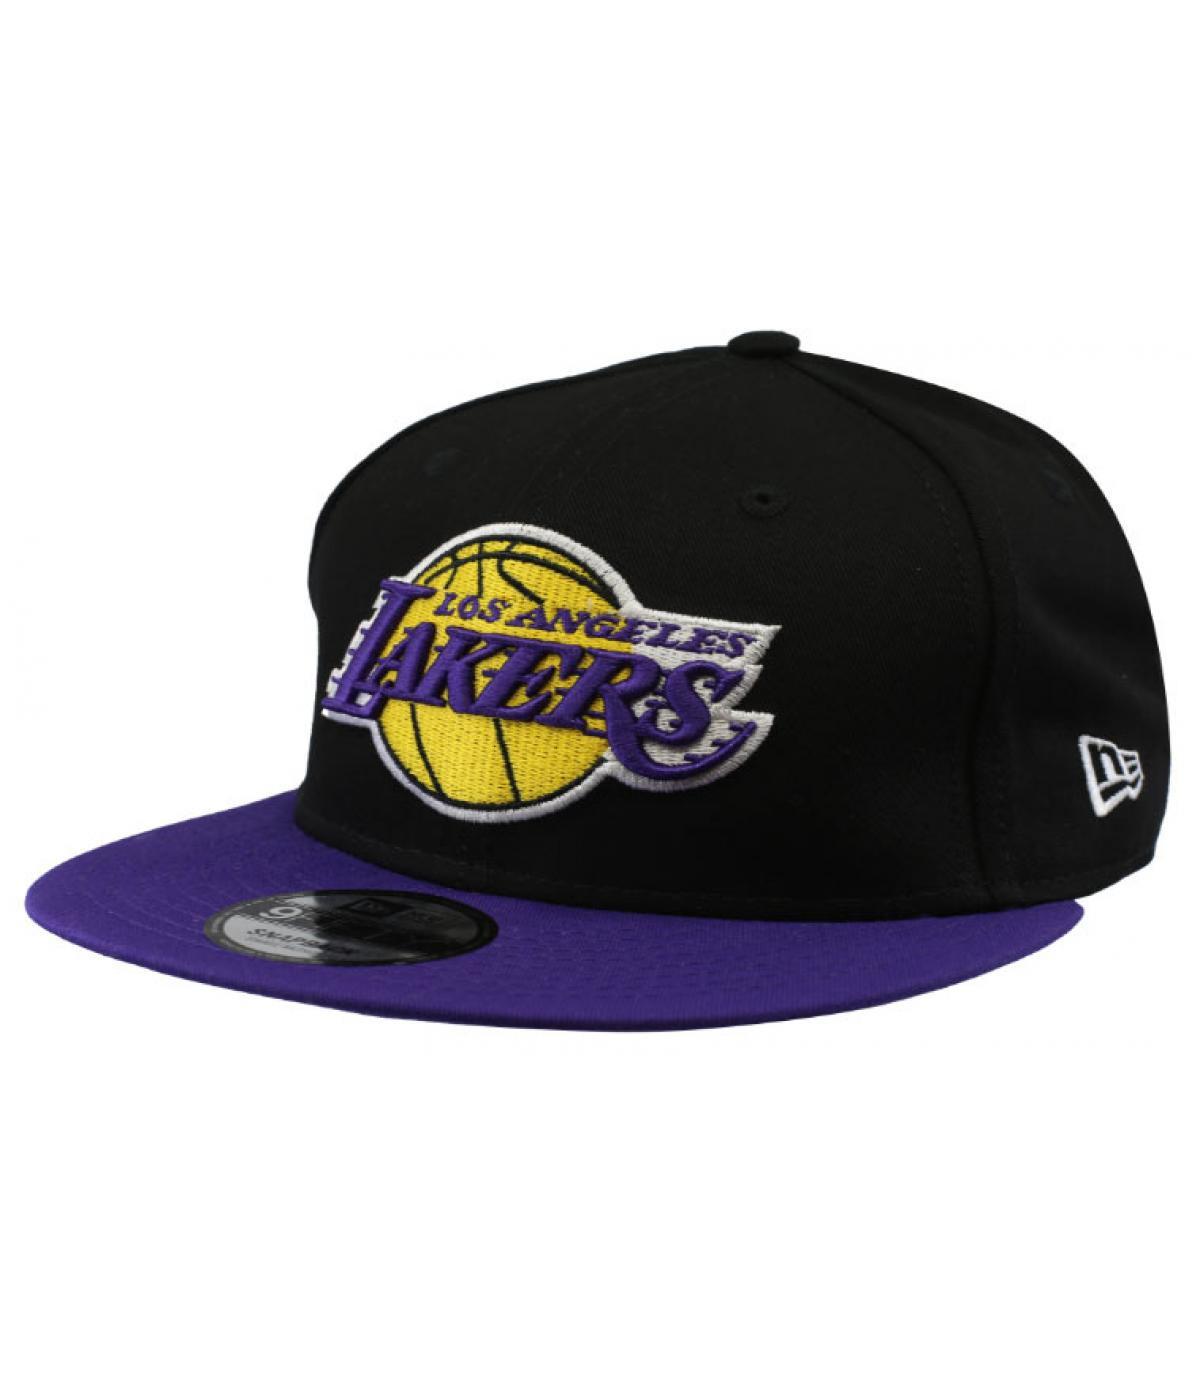 Details Snapback NBA Lakers 950 - Abbildung 2